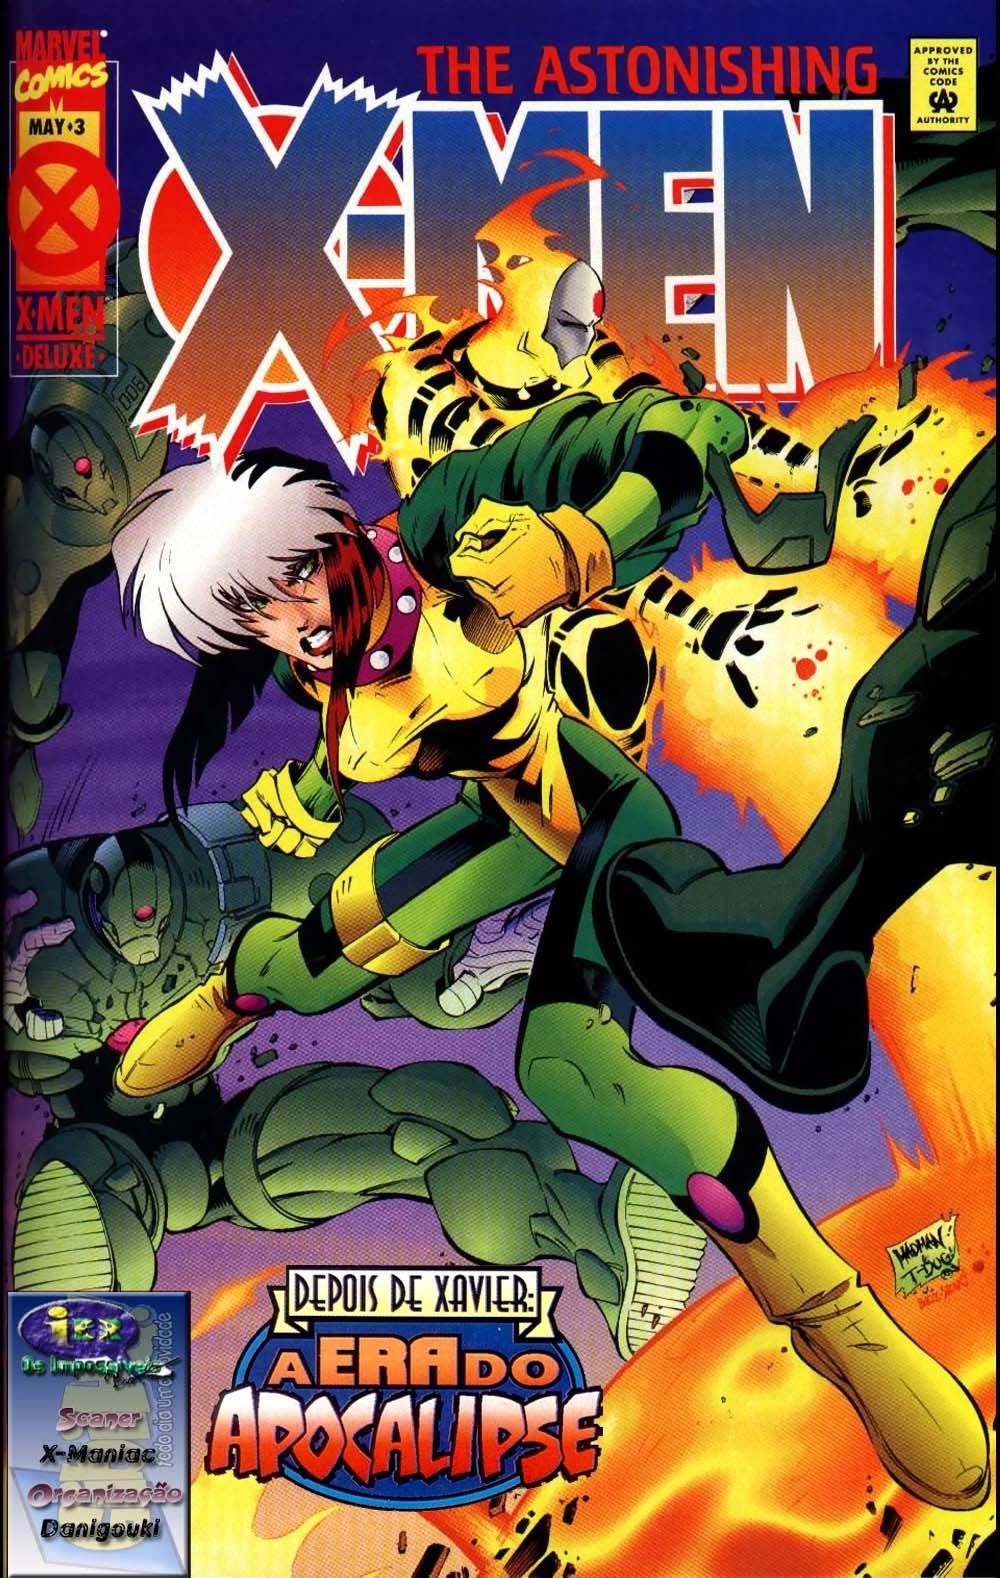 X-Men - A Era do Apocalipse #29